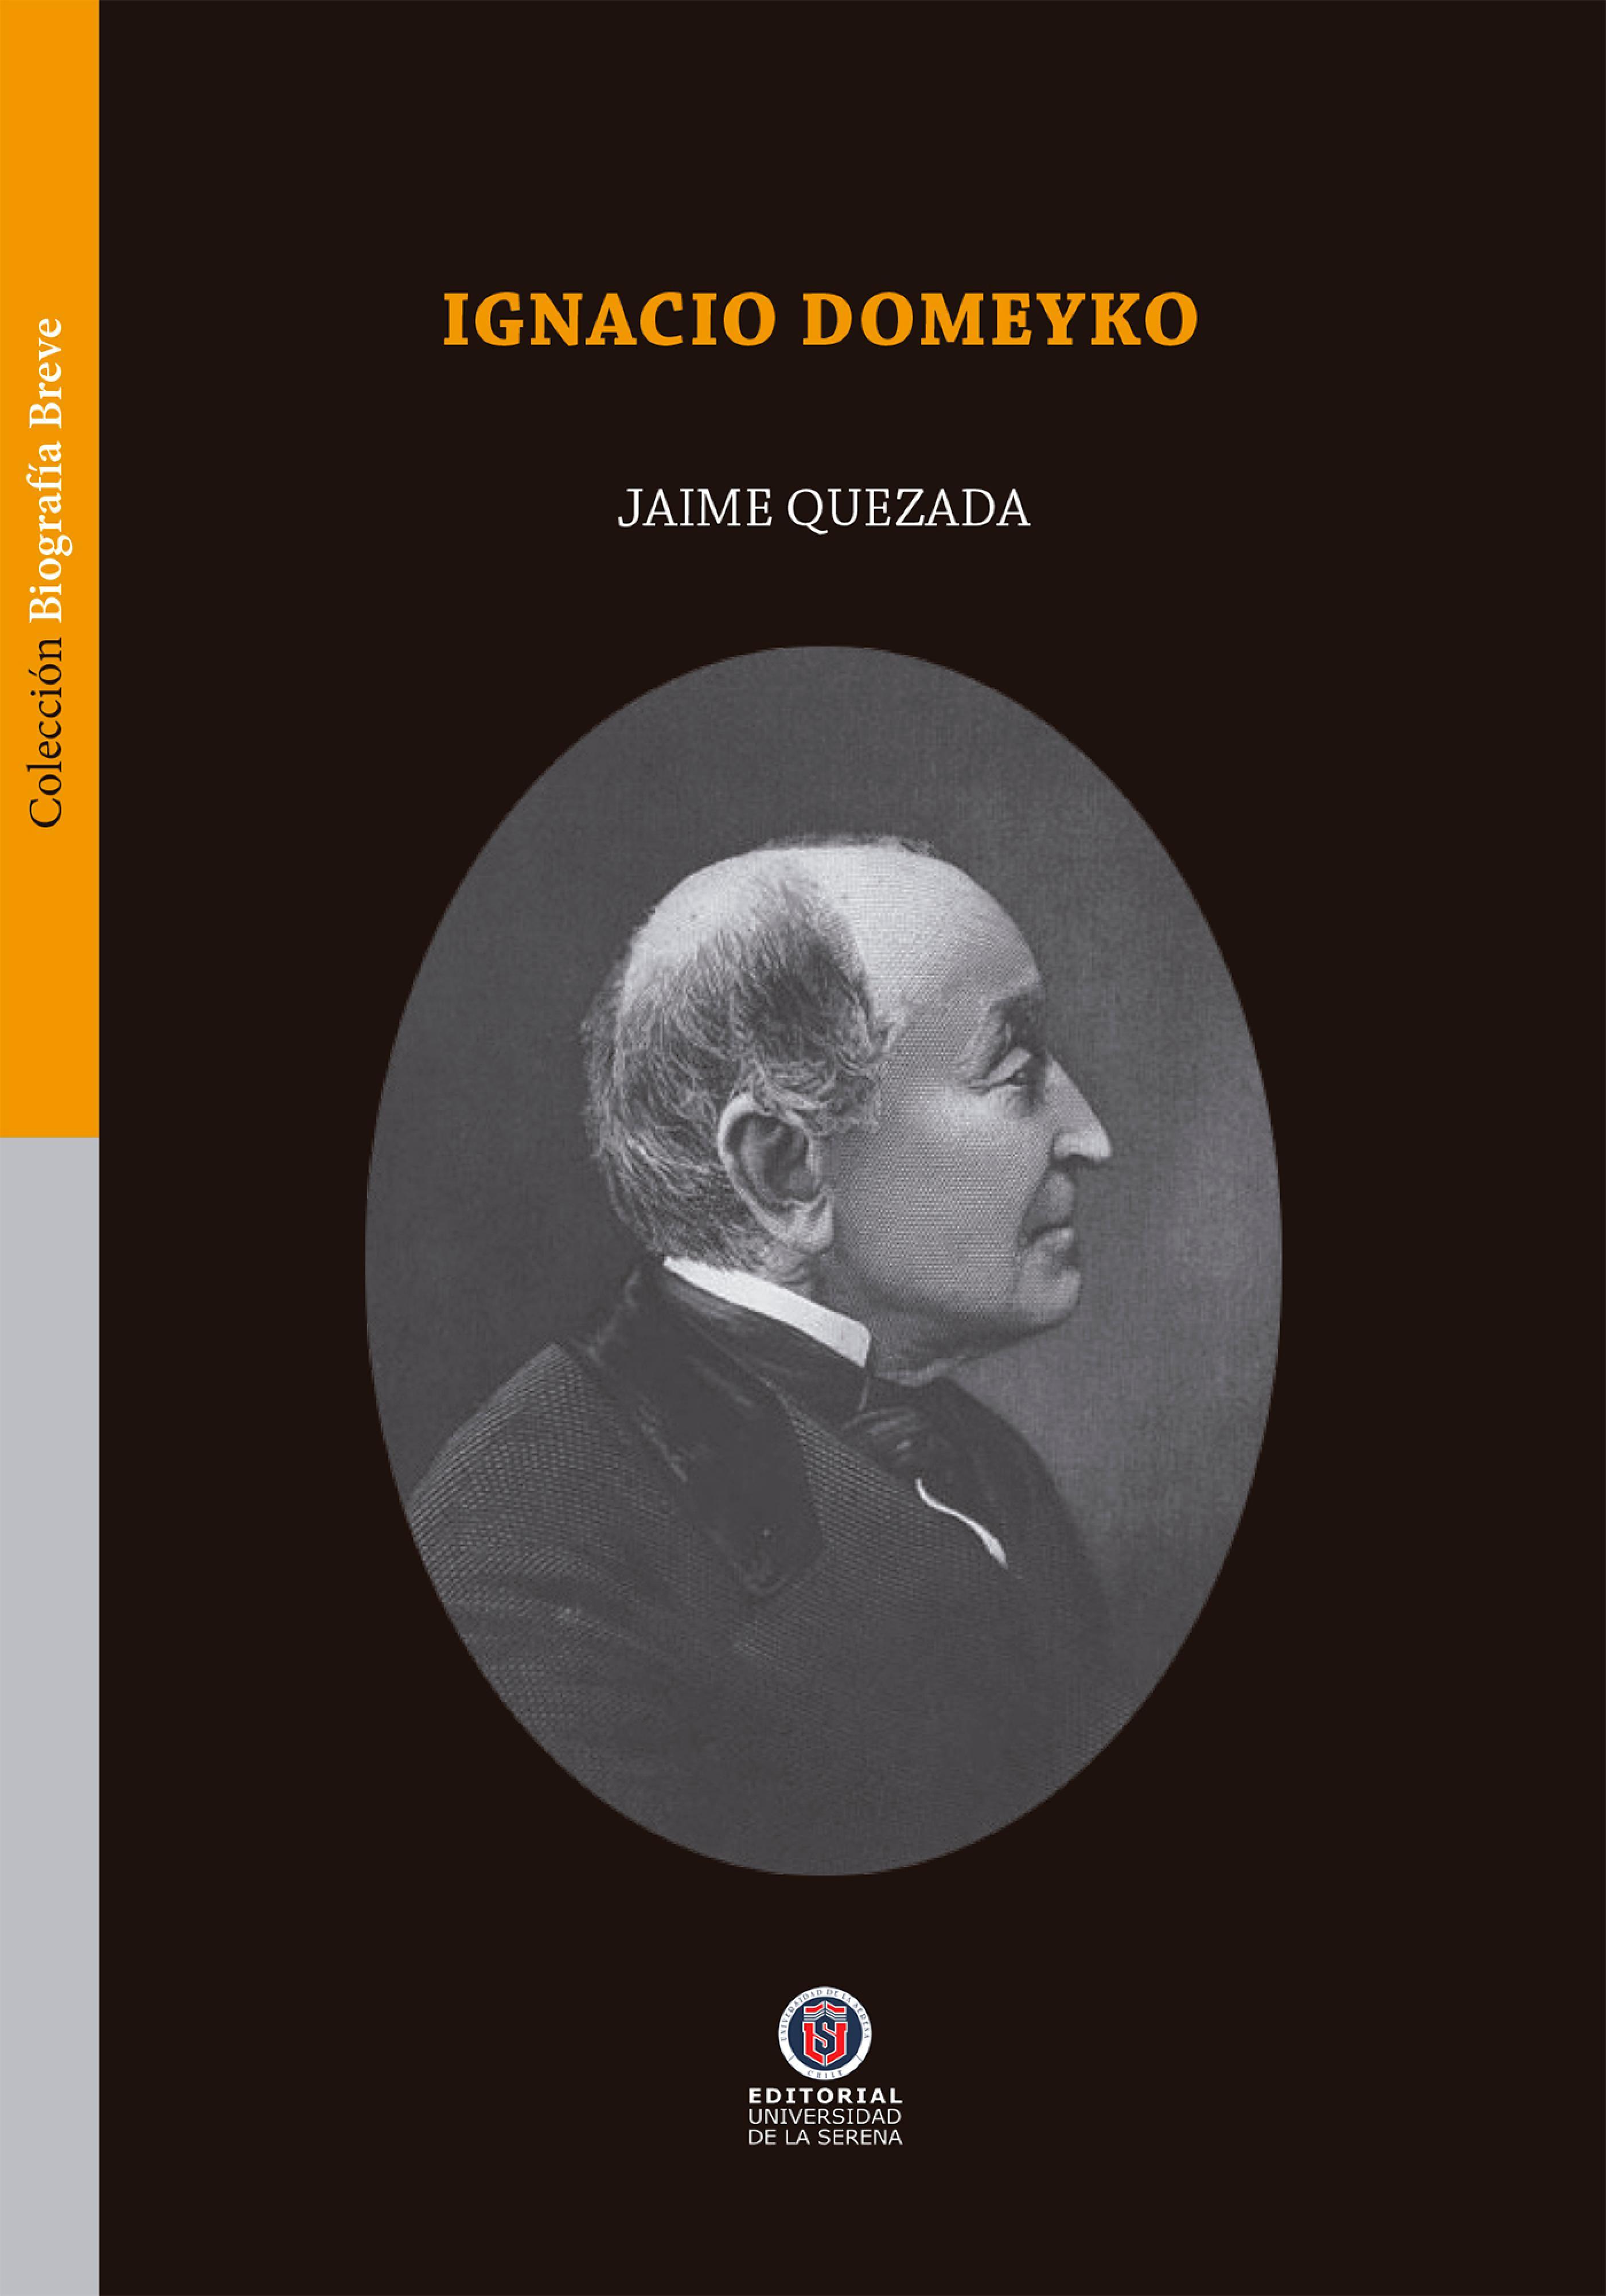 Jaime Quezada Ignacio Domeyko